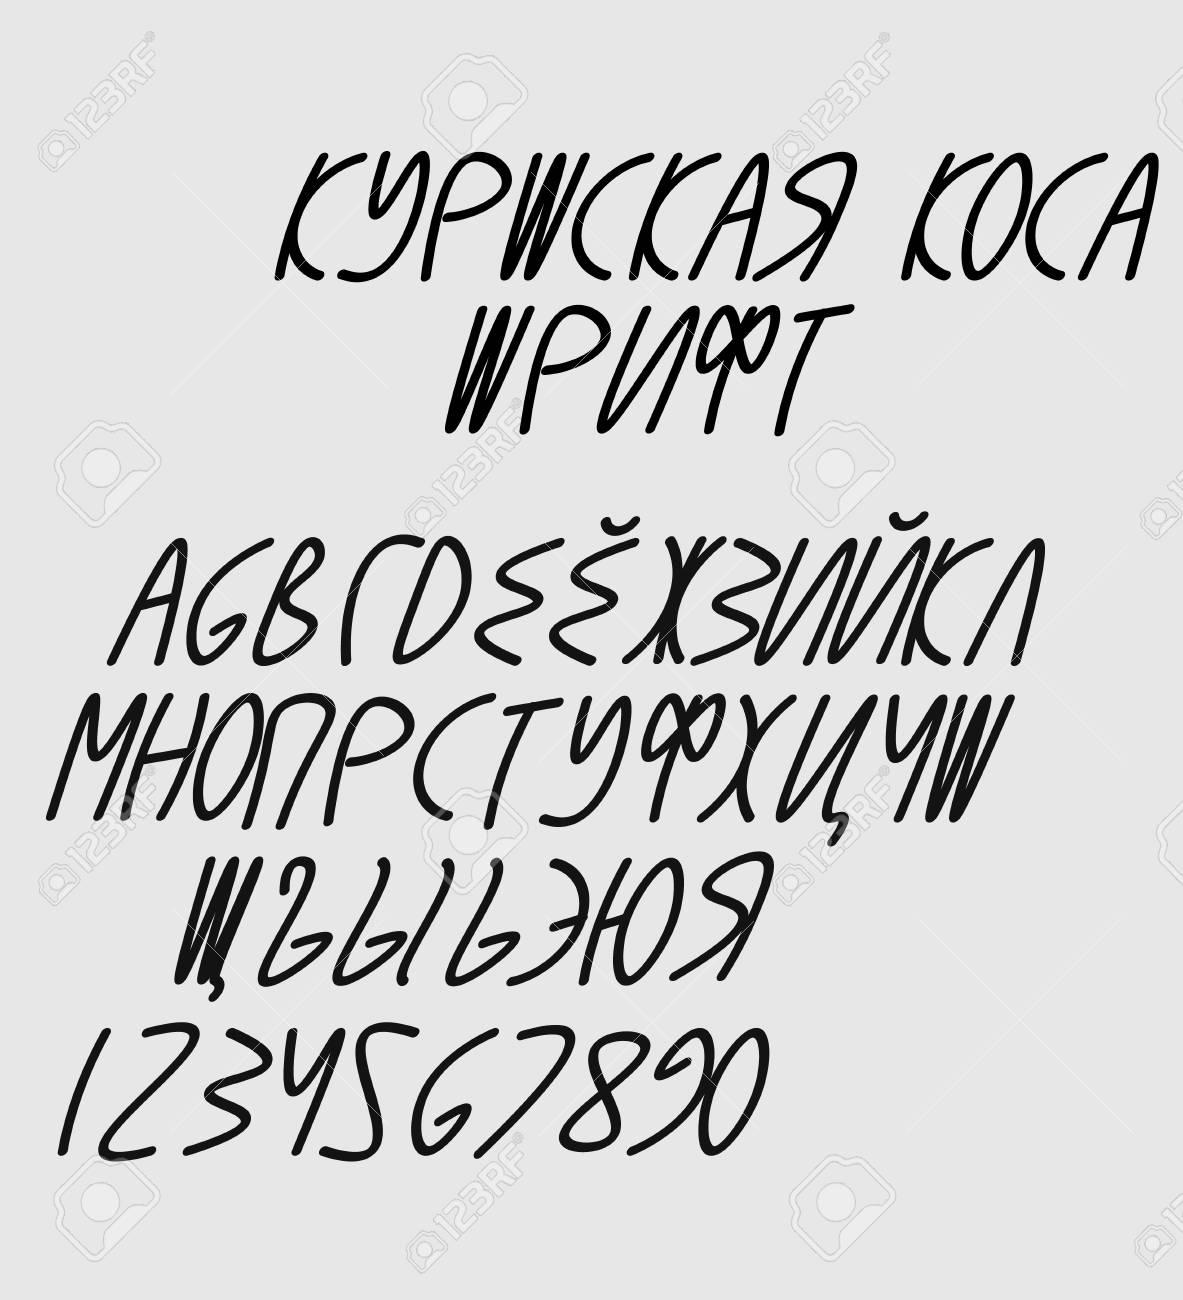 Russian regular italic font - Curonian Spit